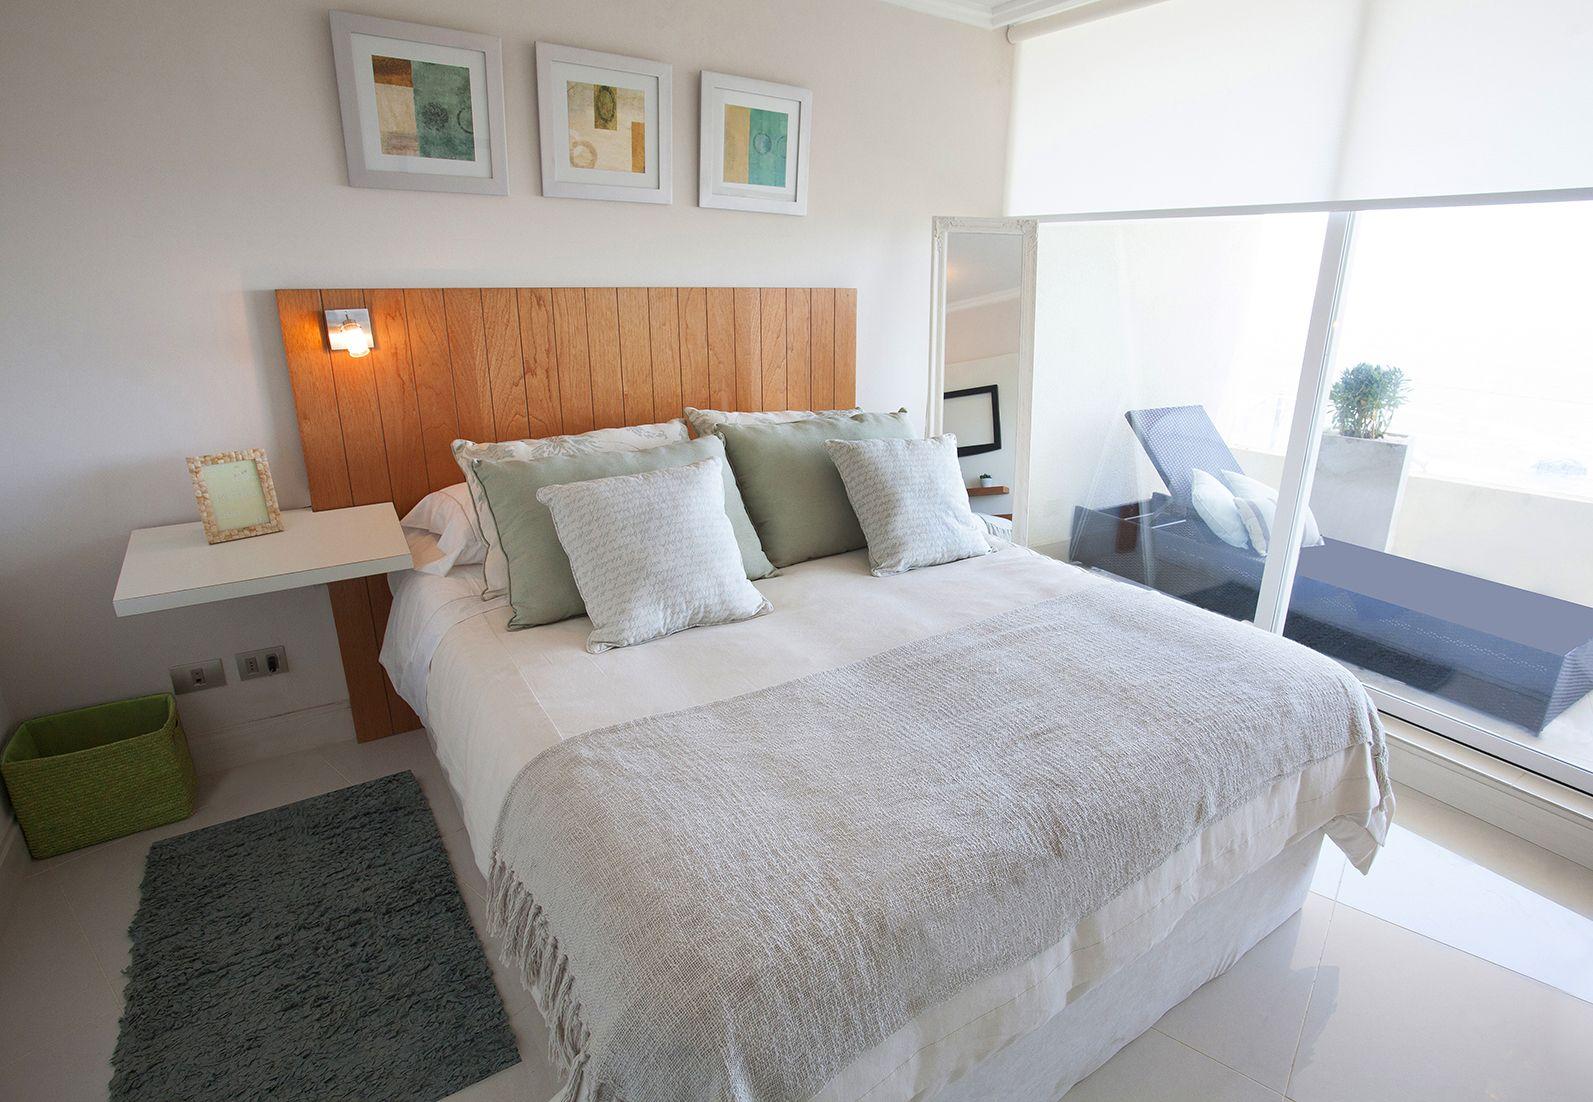 Dormitorio principal I, Terraza Pacífico